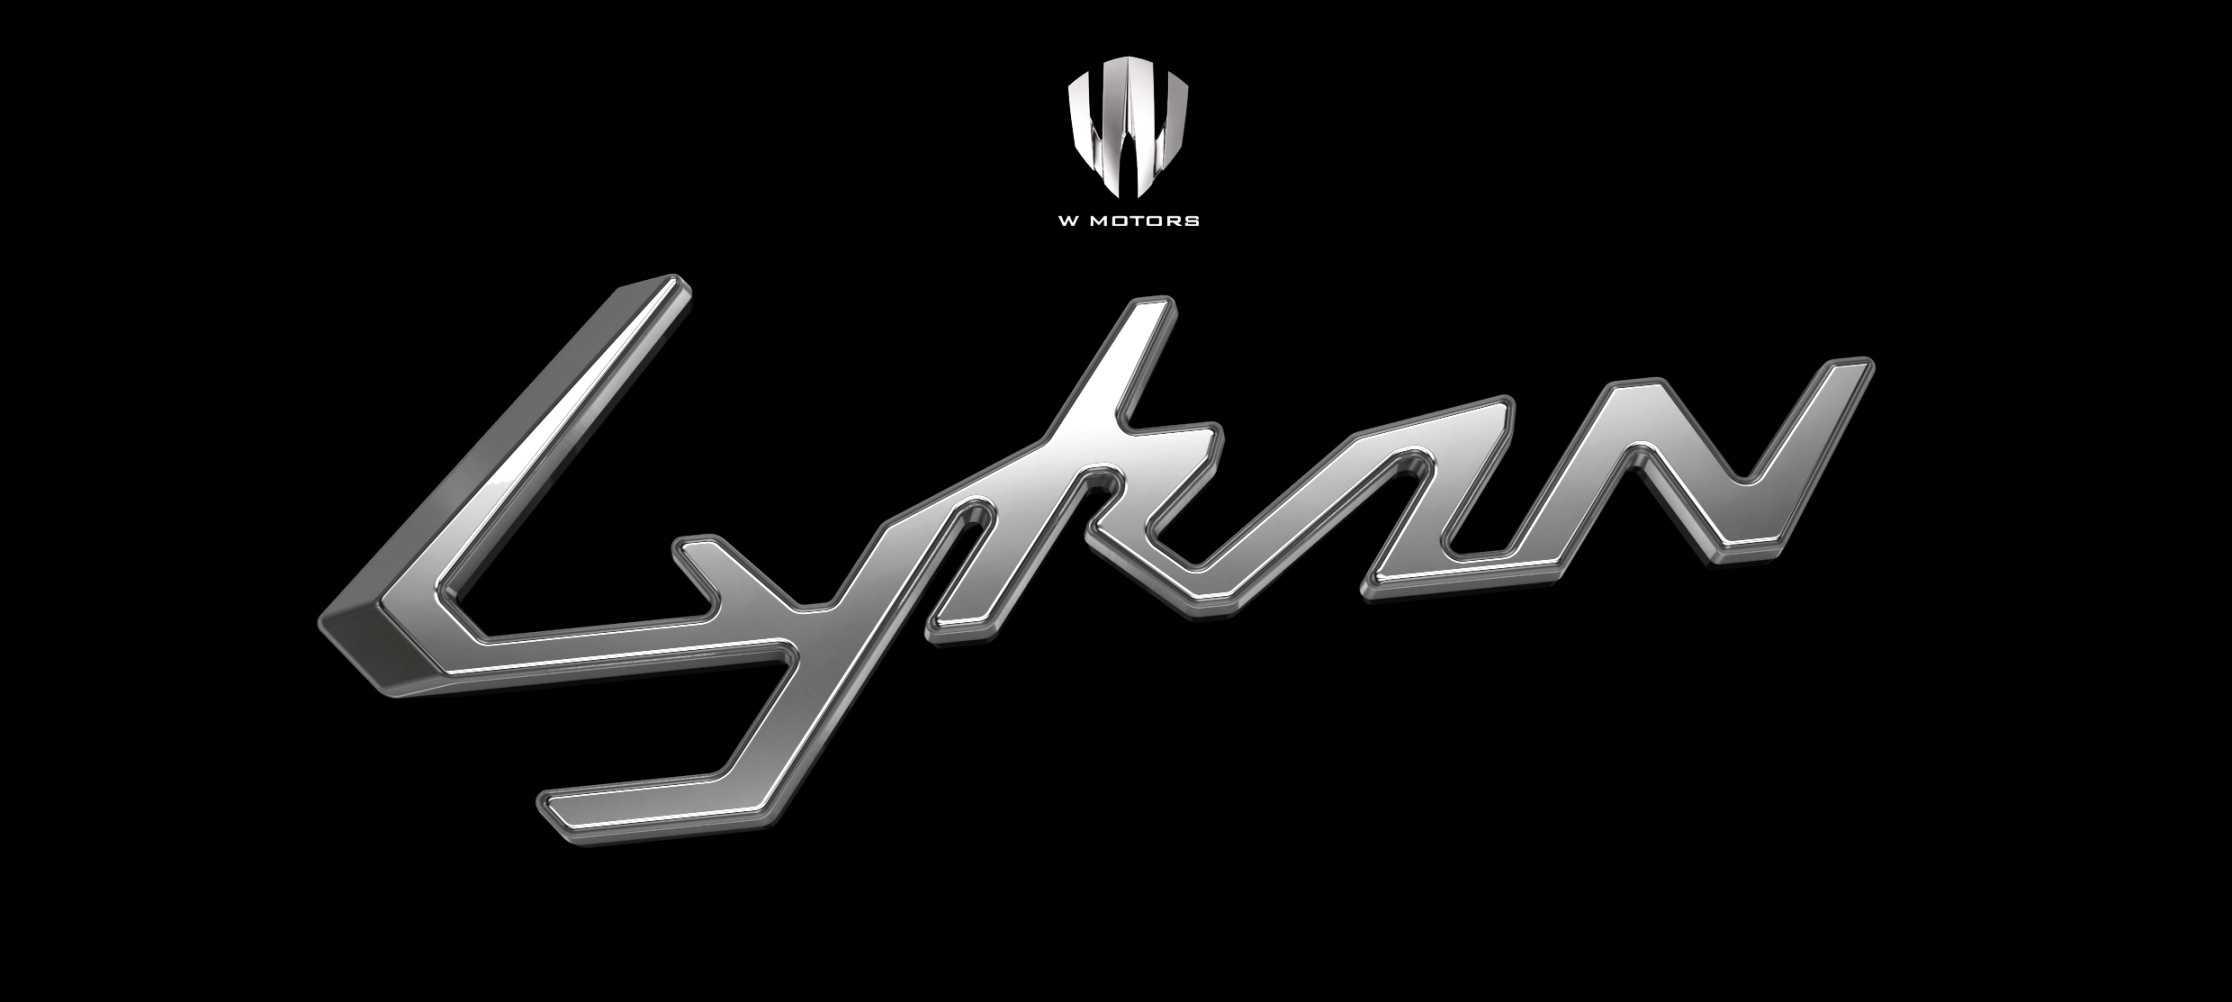 Wmotors Lykan Hypersport >> 2014 W Motors Lykan Hypersport in 40+ Amazing New Wallpapers, Including MegaLux Interior